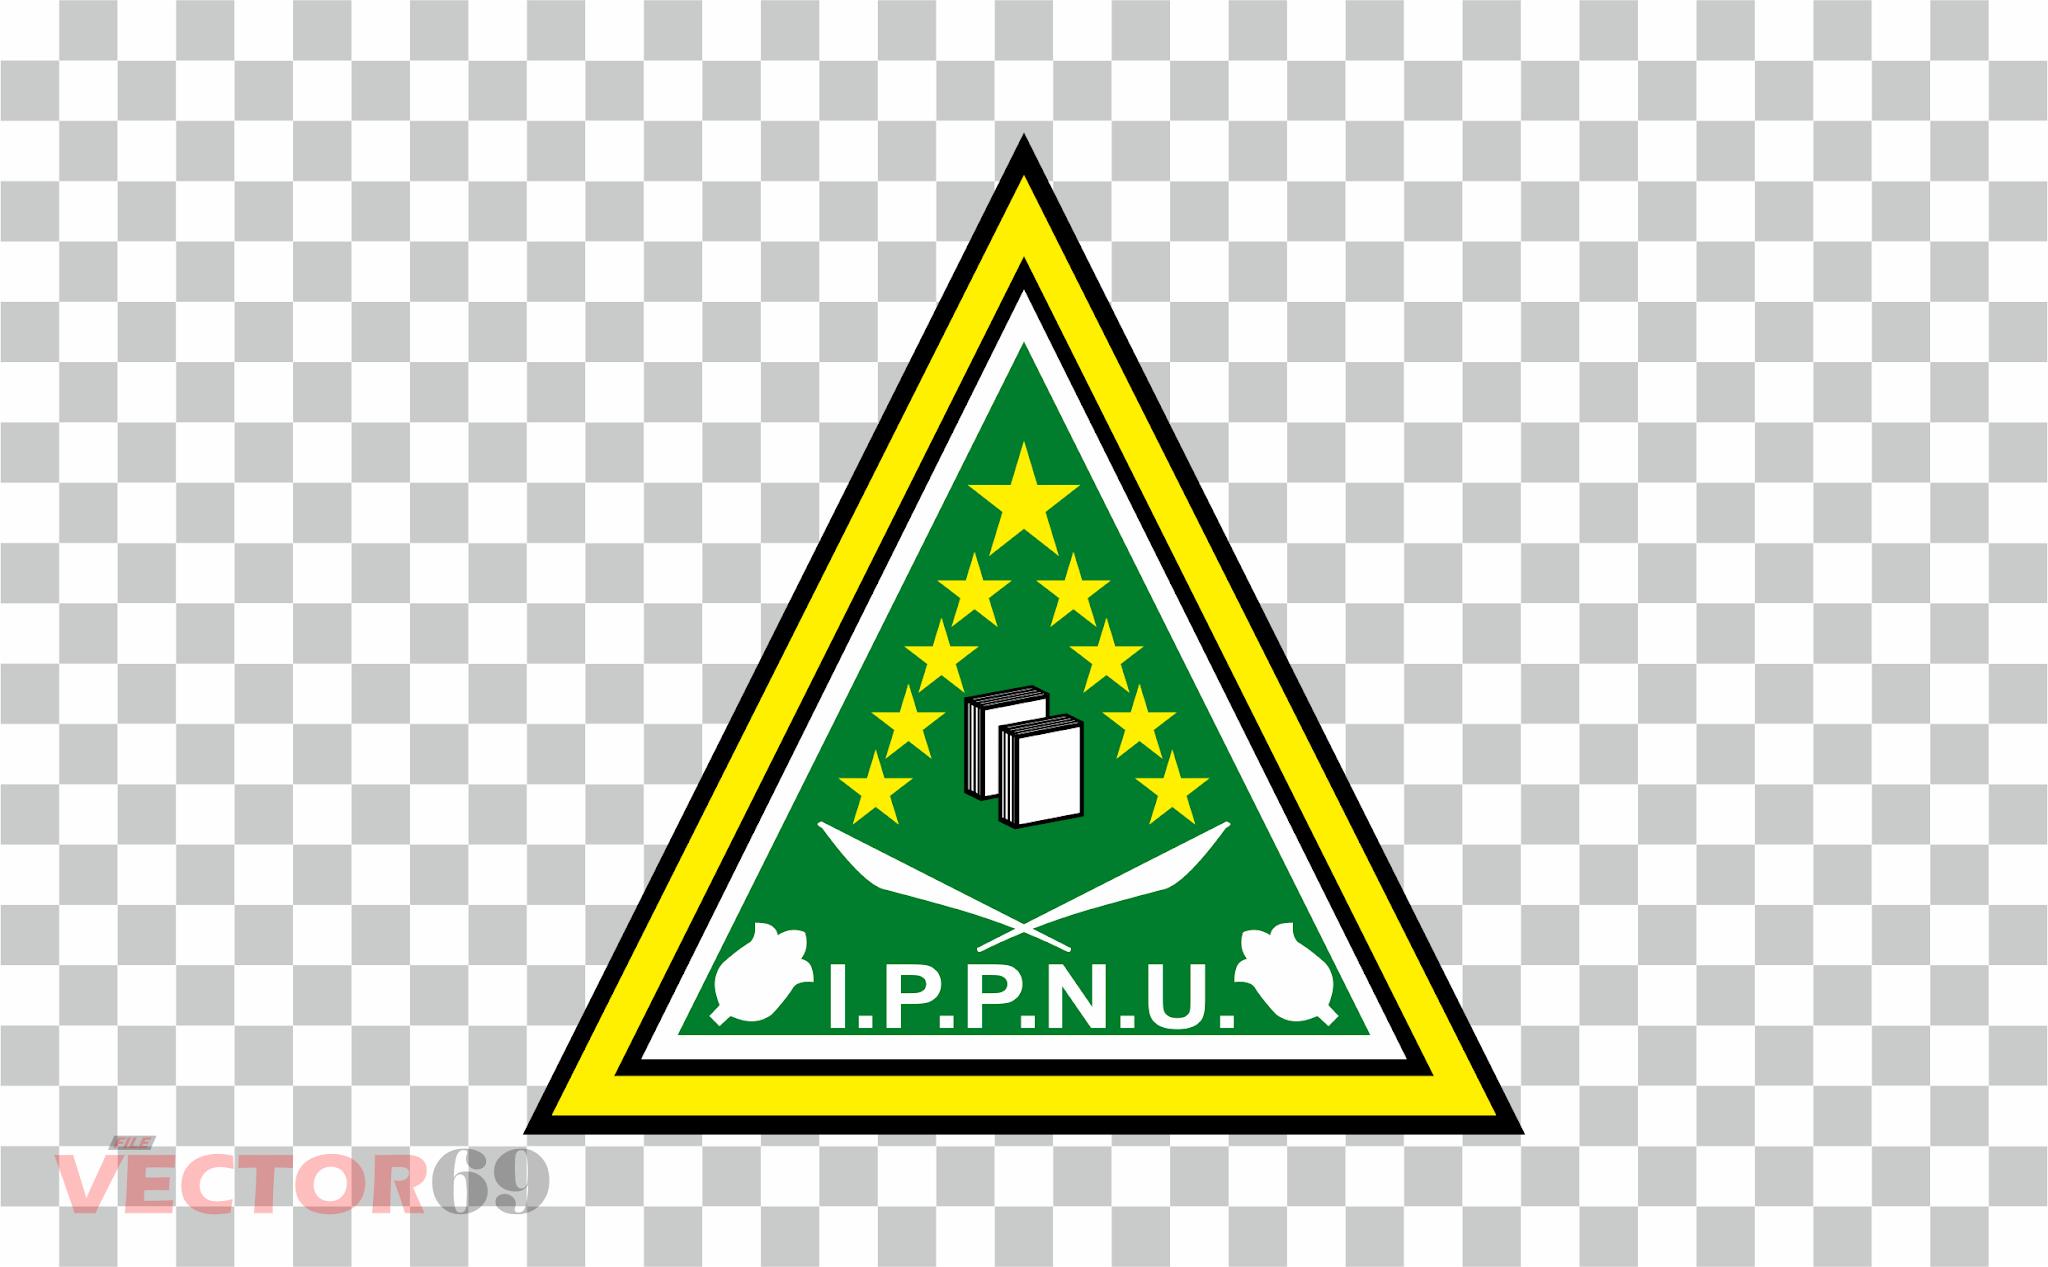 IPPNU (Ikatan Pelajar Putri Nahdlatul Ulama) Logo - Download Vector File PNG (Portable Network Graphics)